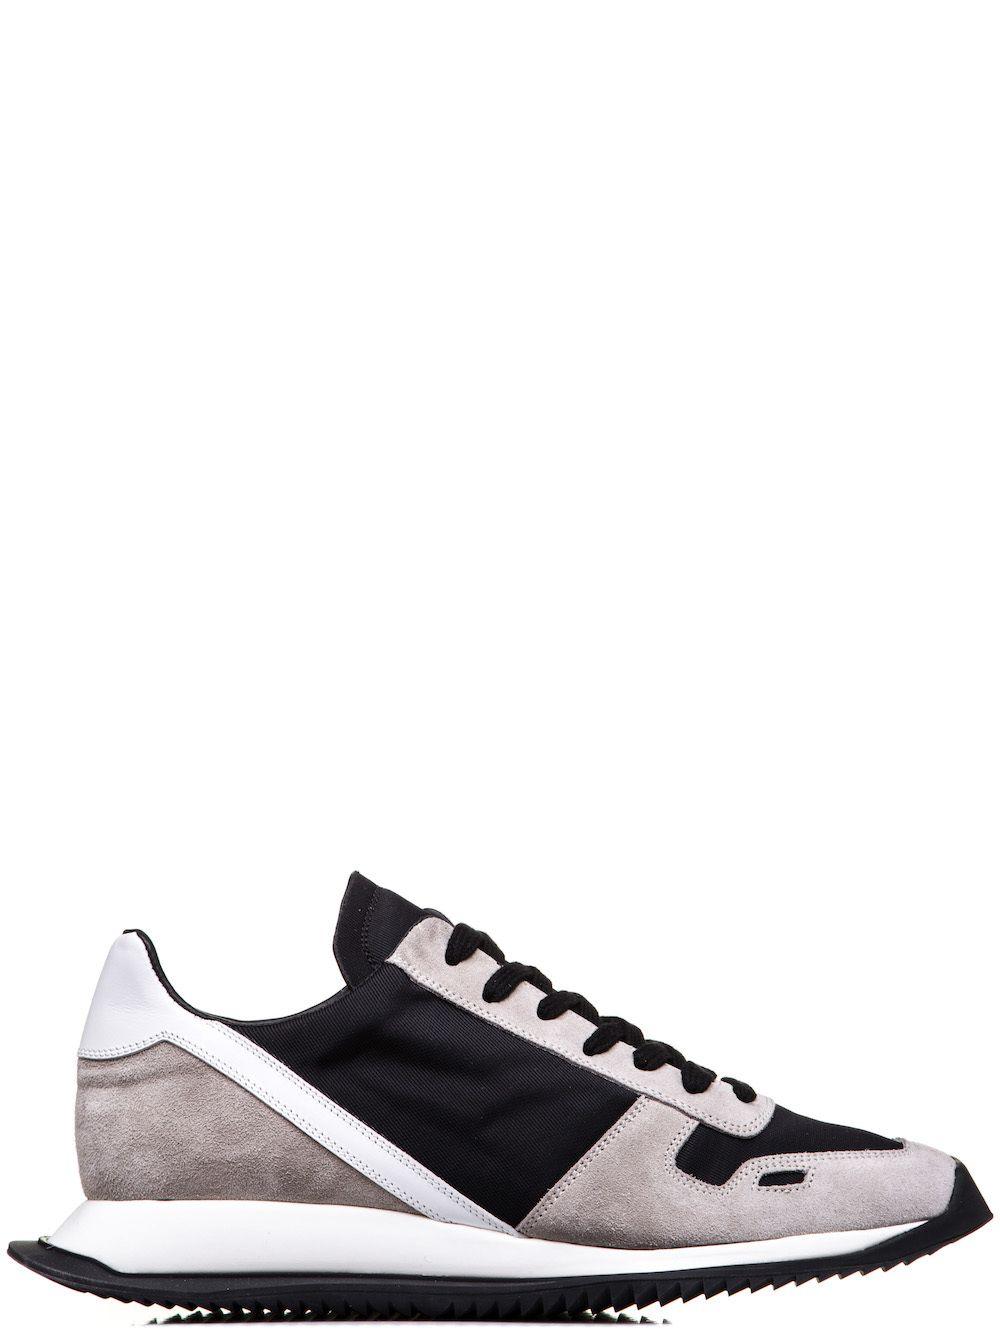 Fashion shoes, Mens trainers